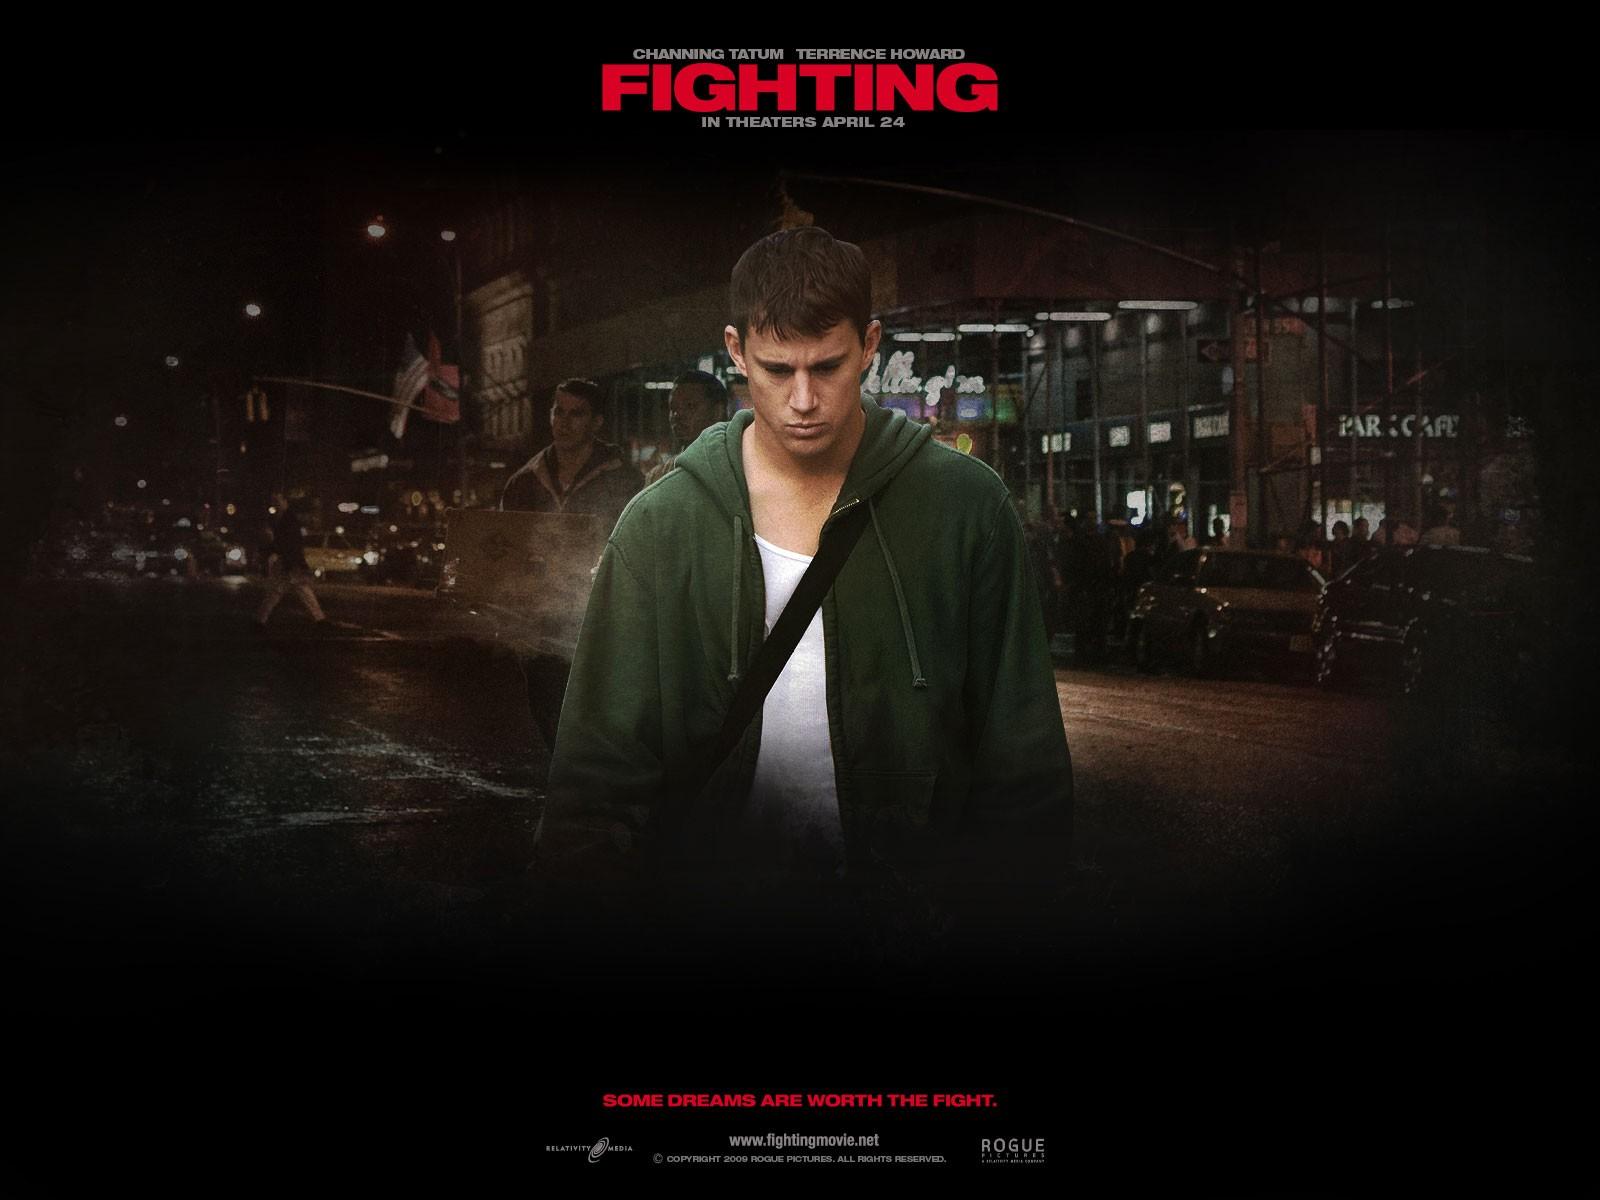 Wallpaper del film Fighting con Channing Tatum